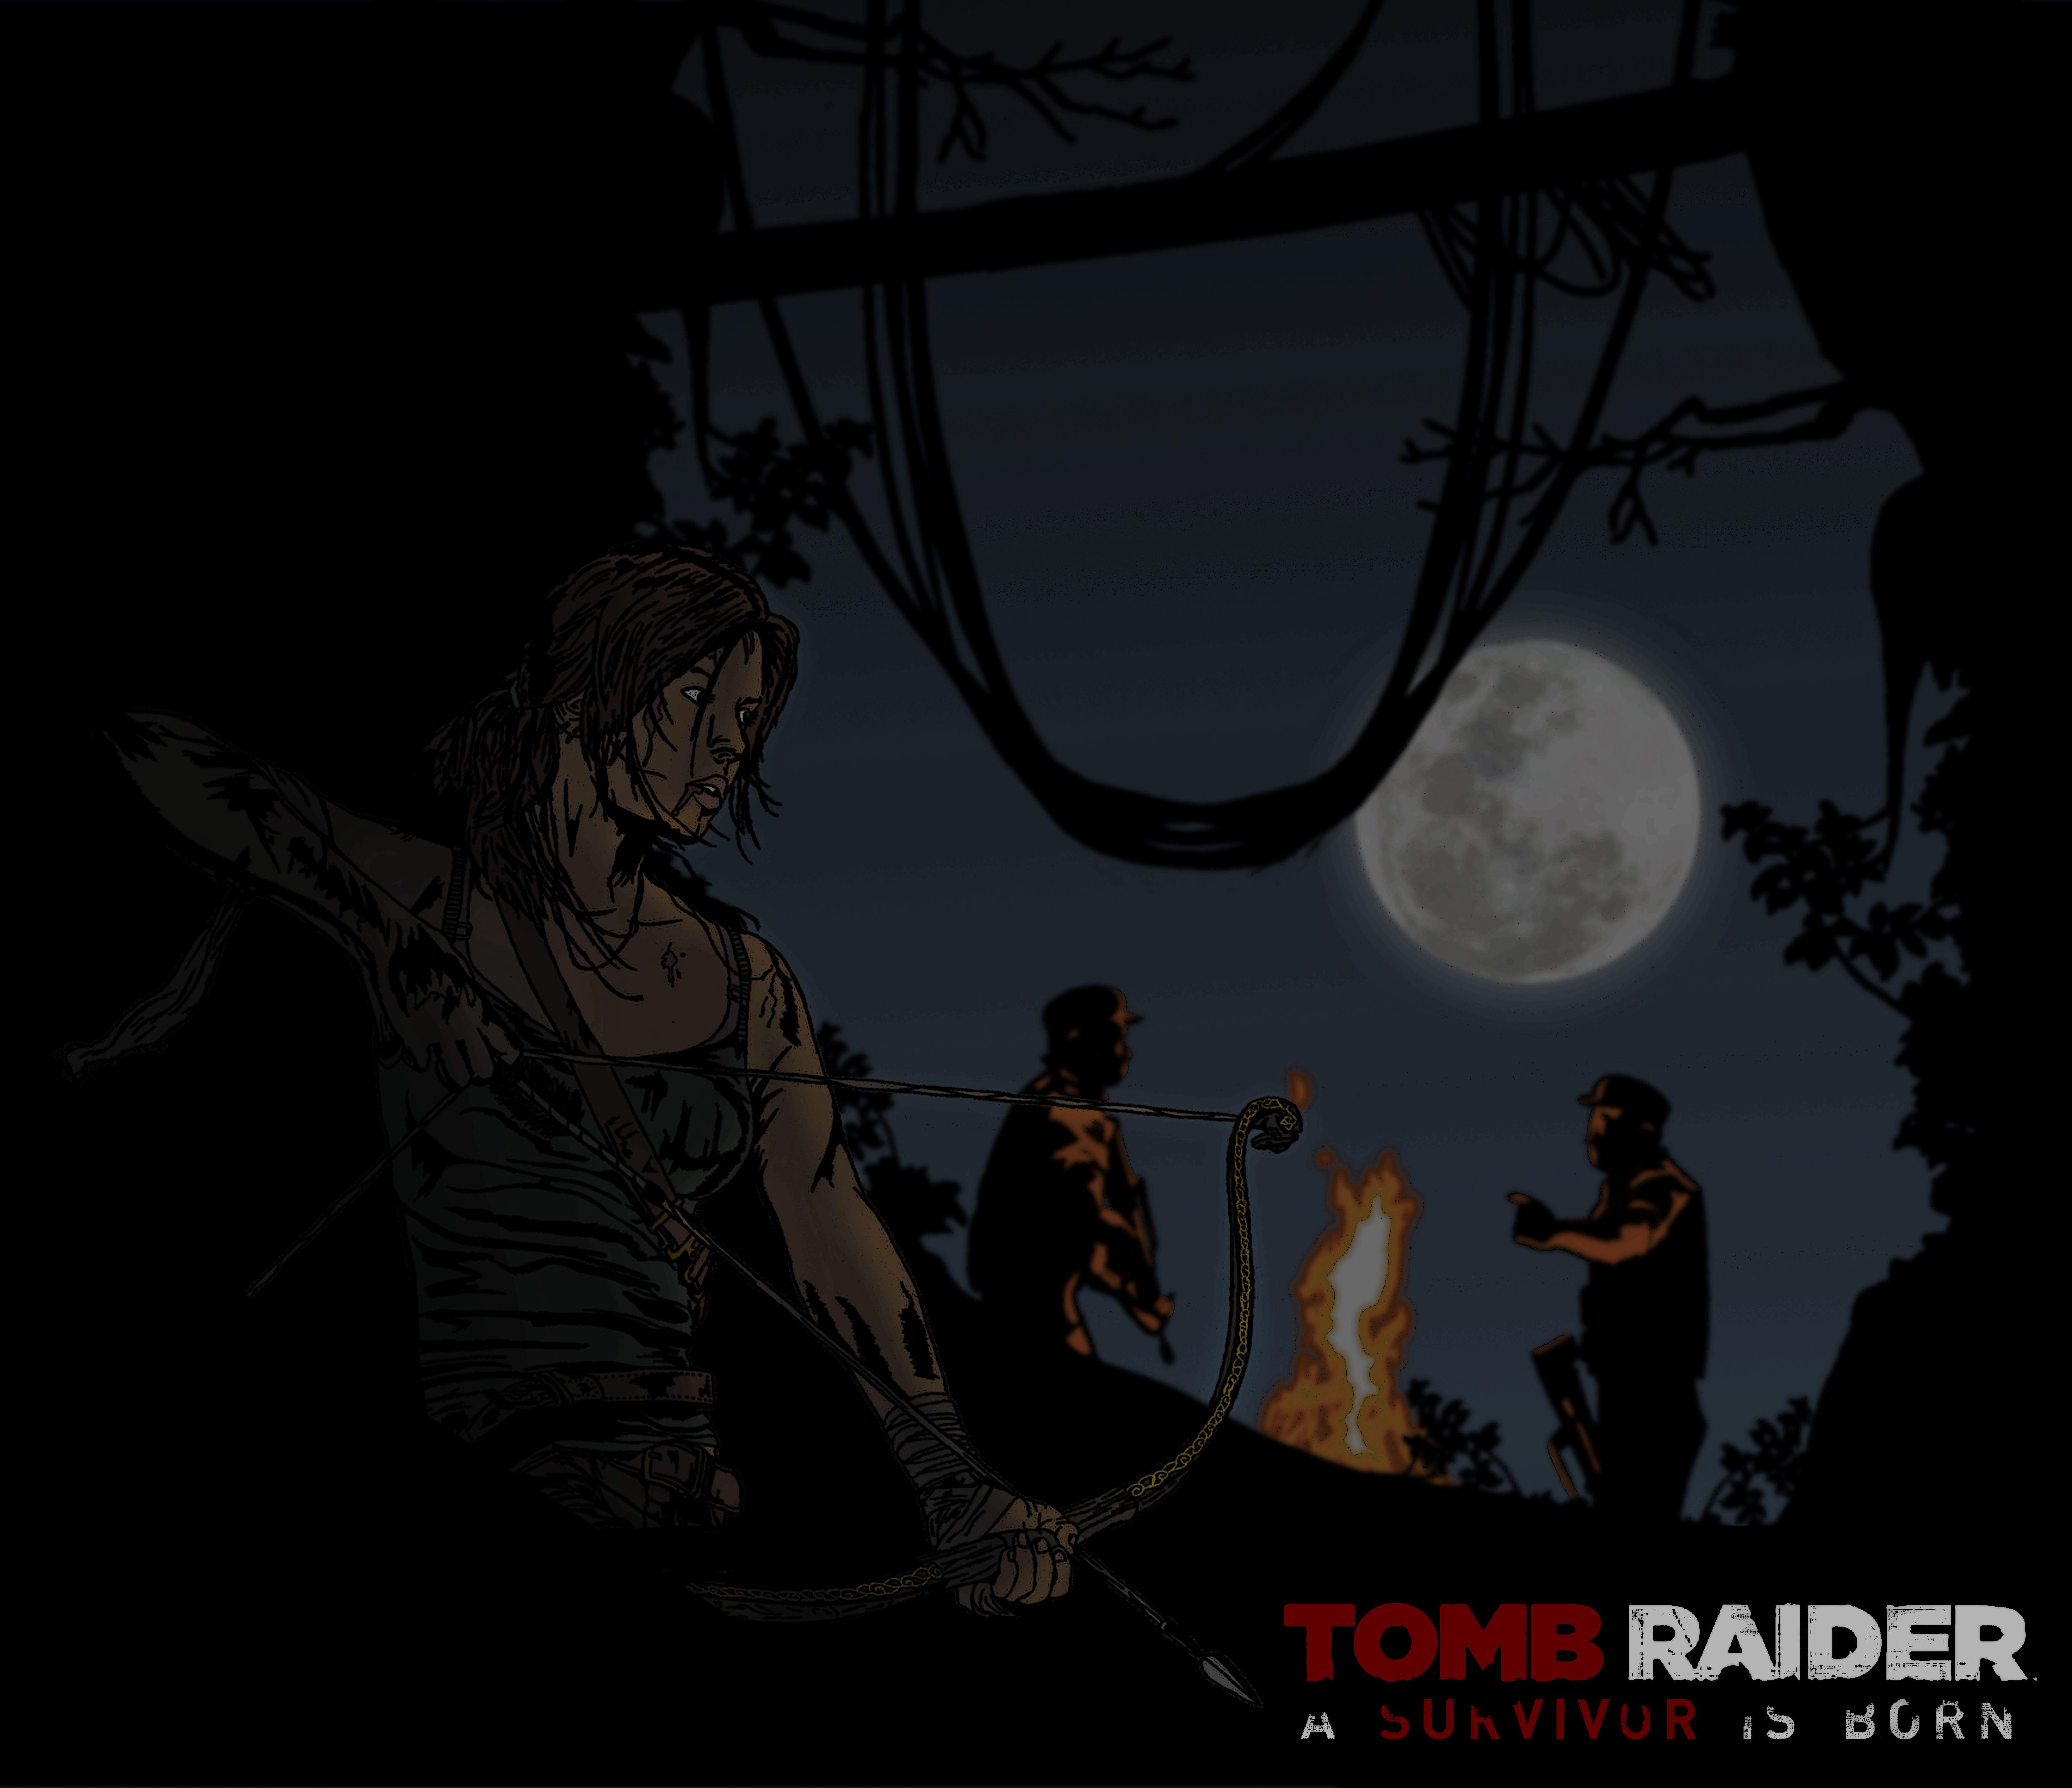 Tomb Raider Reborn Entry by quintajo